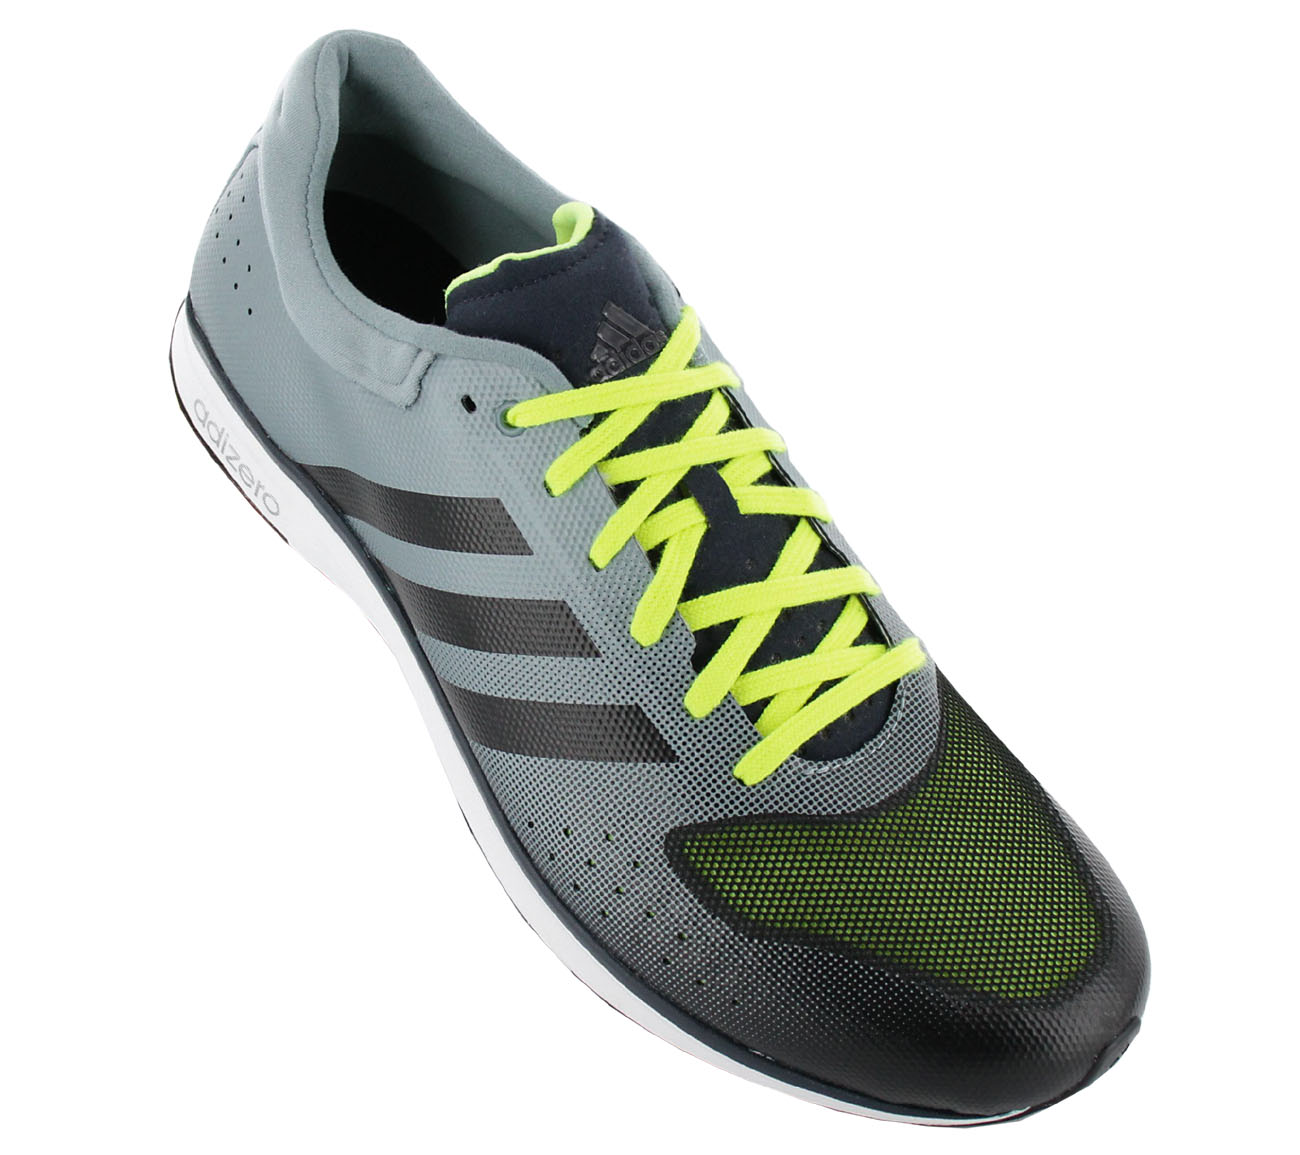 adidas Adizero F50 RNR Schuhe Herren Laufschuhe Grau Running